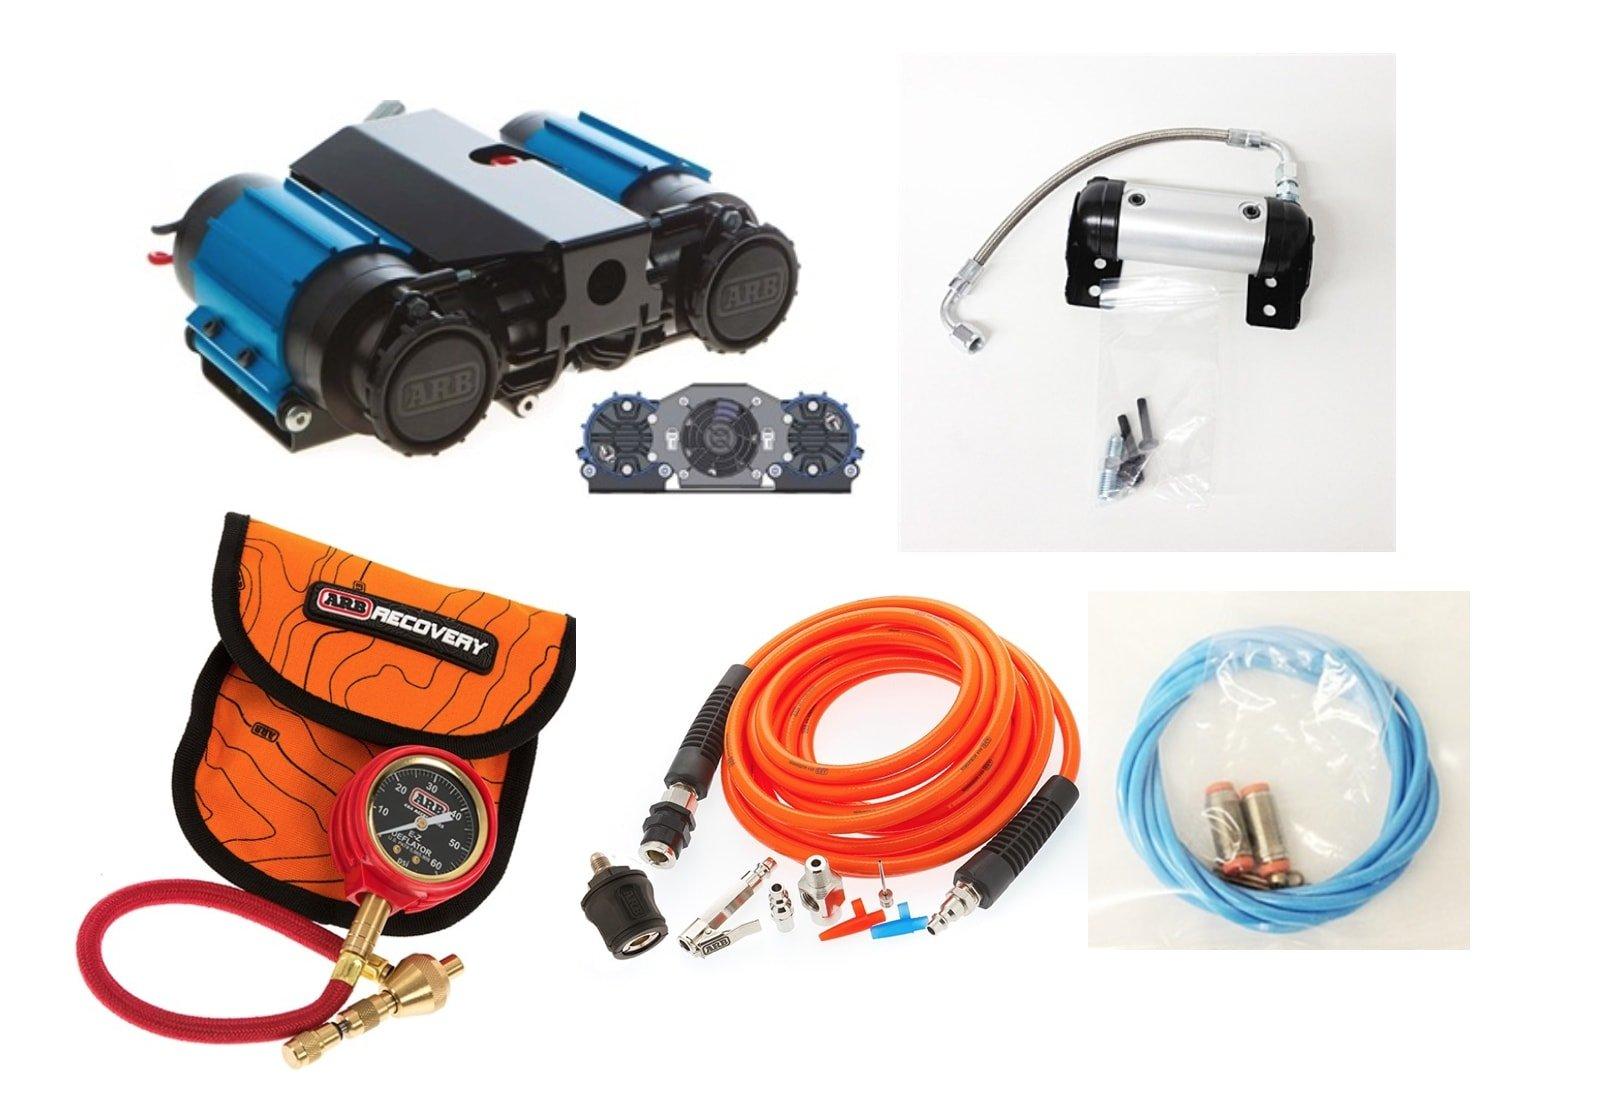 ARB 12 Volt High Performance Twin Air Compressor & E-Z Deflator , Airline, Tire Inflation Kit & Air Locker Manifold Kit